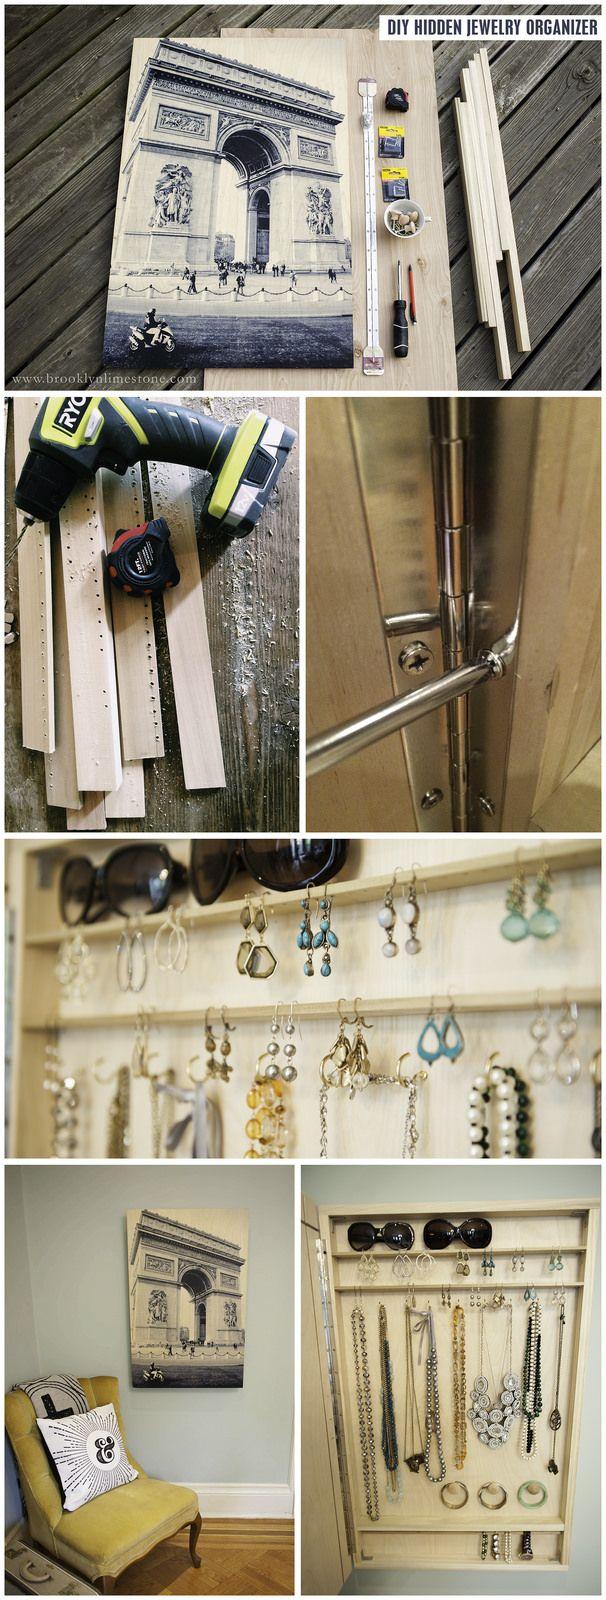 DIY Hidden Jewelry Organizer